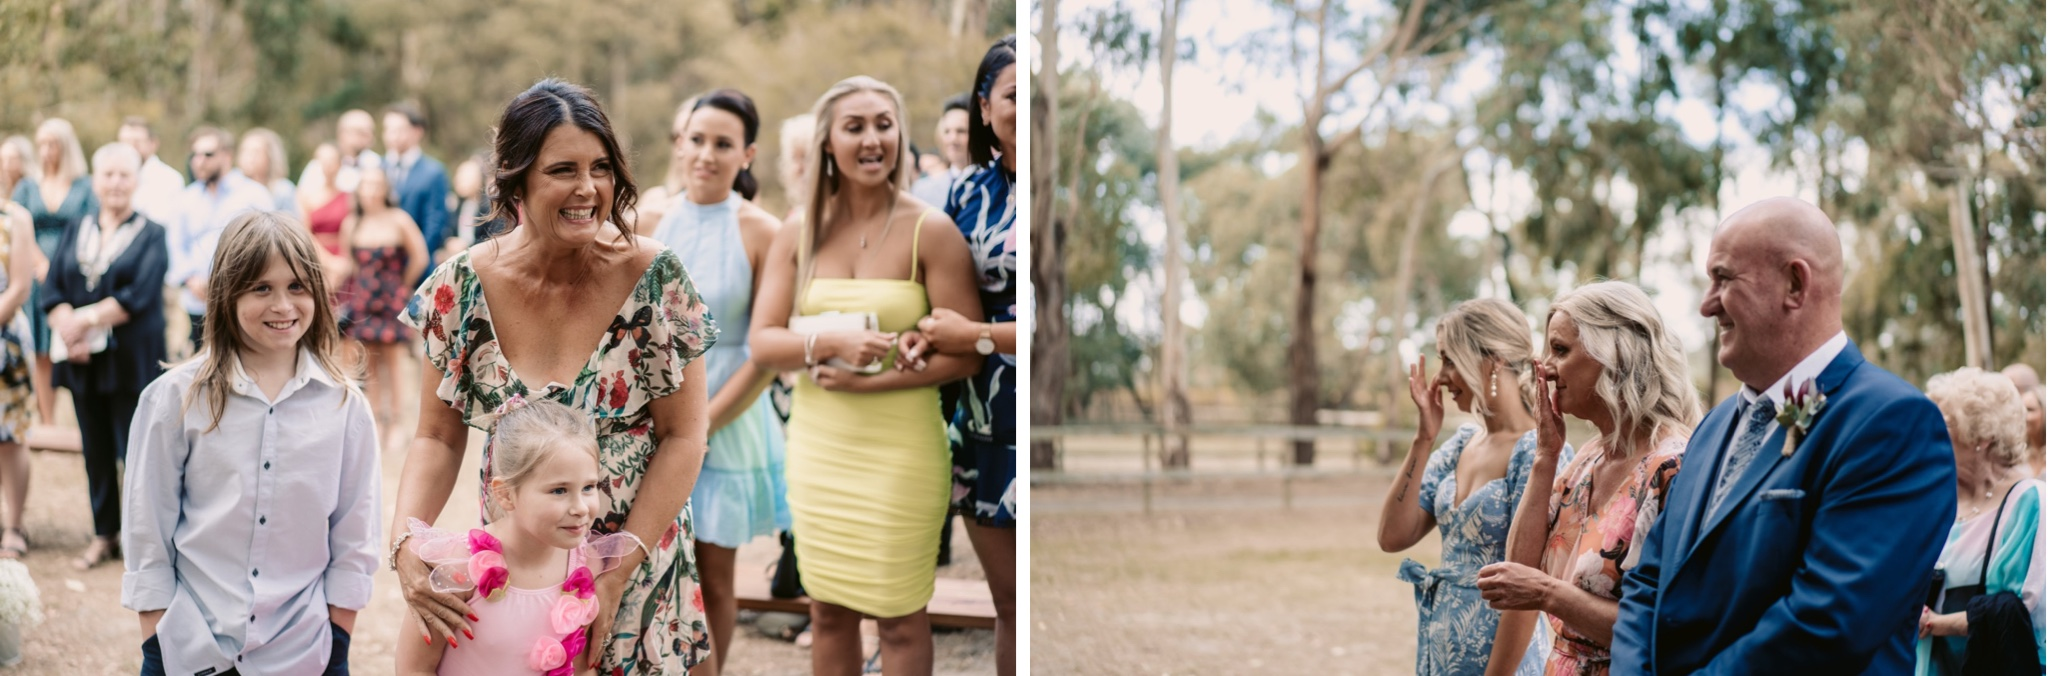 Mornington Peninsula Wedding Photography44.jpg